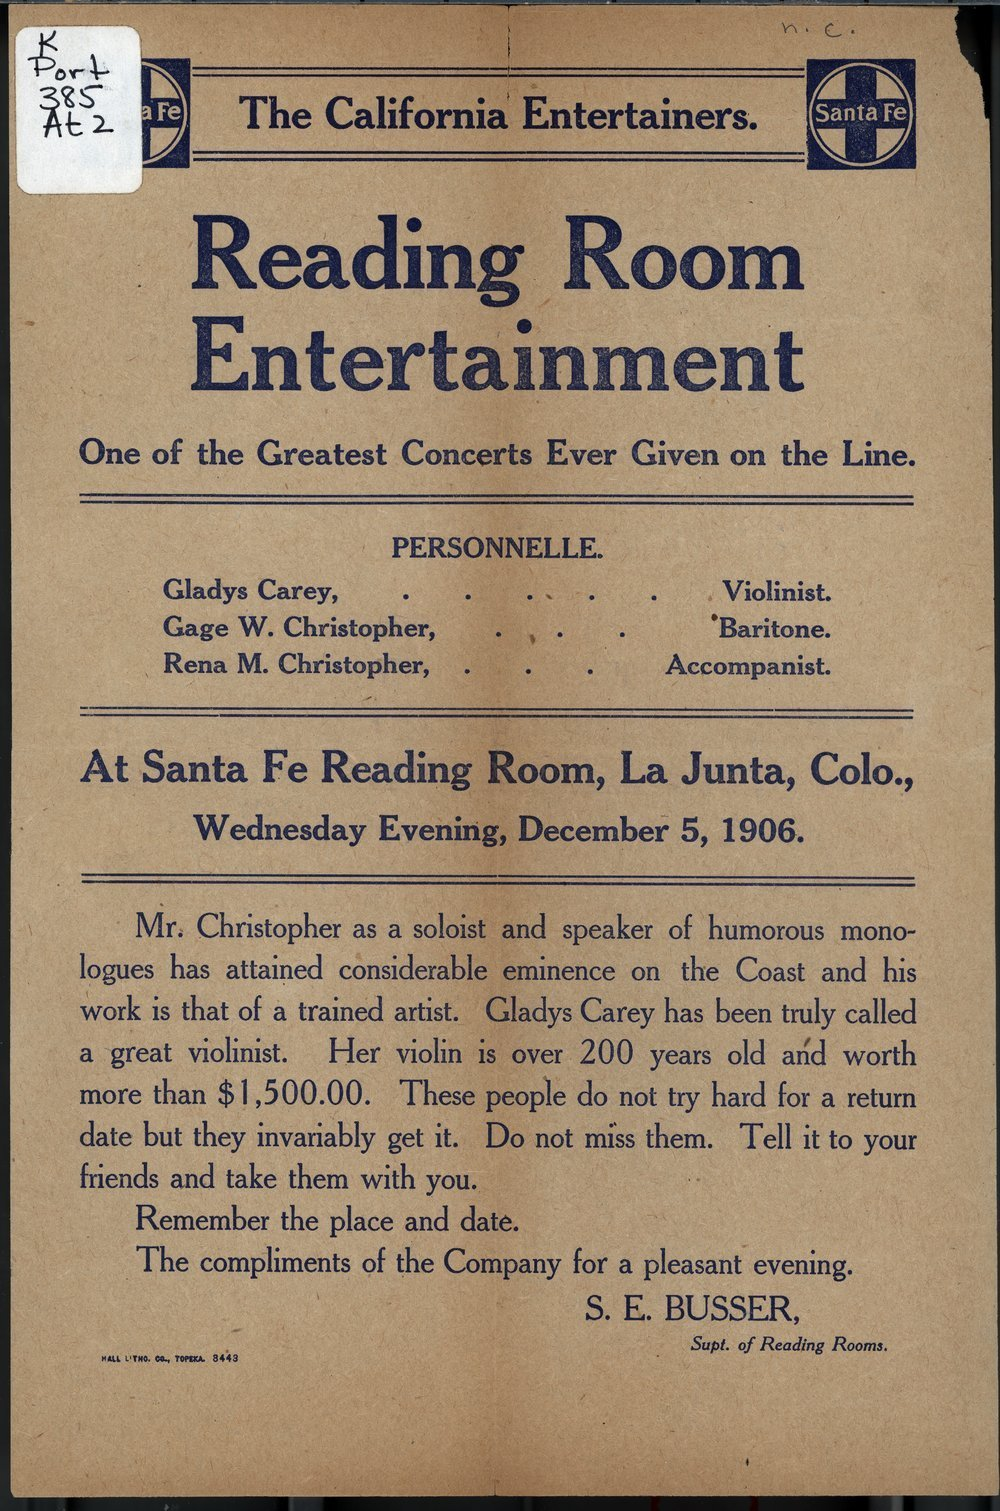 Santa Fe reading room entertainment